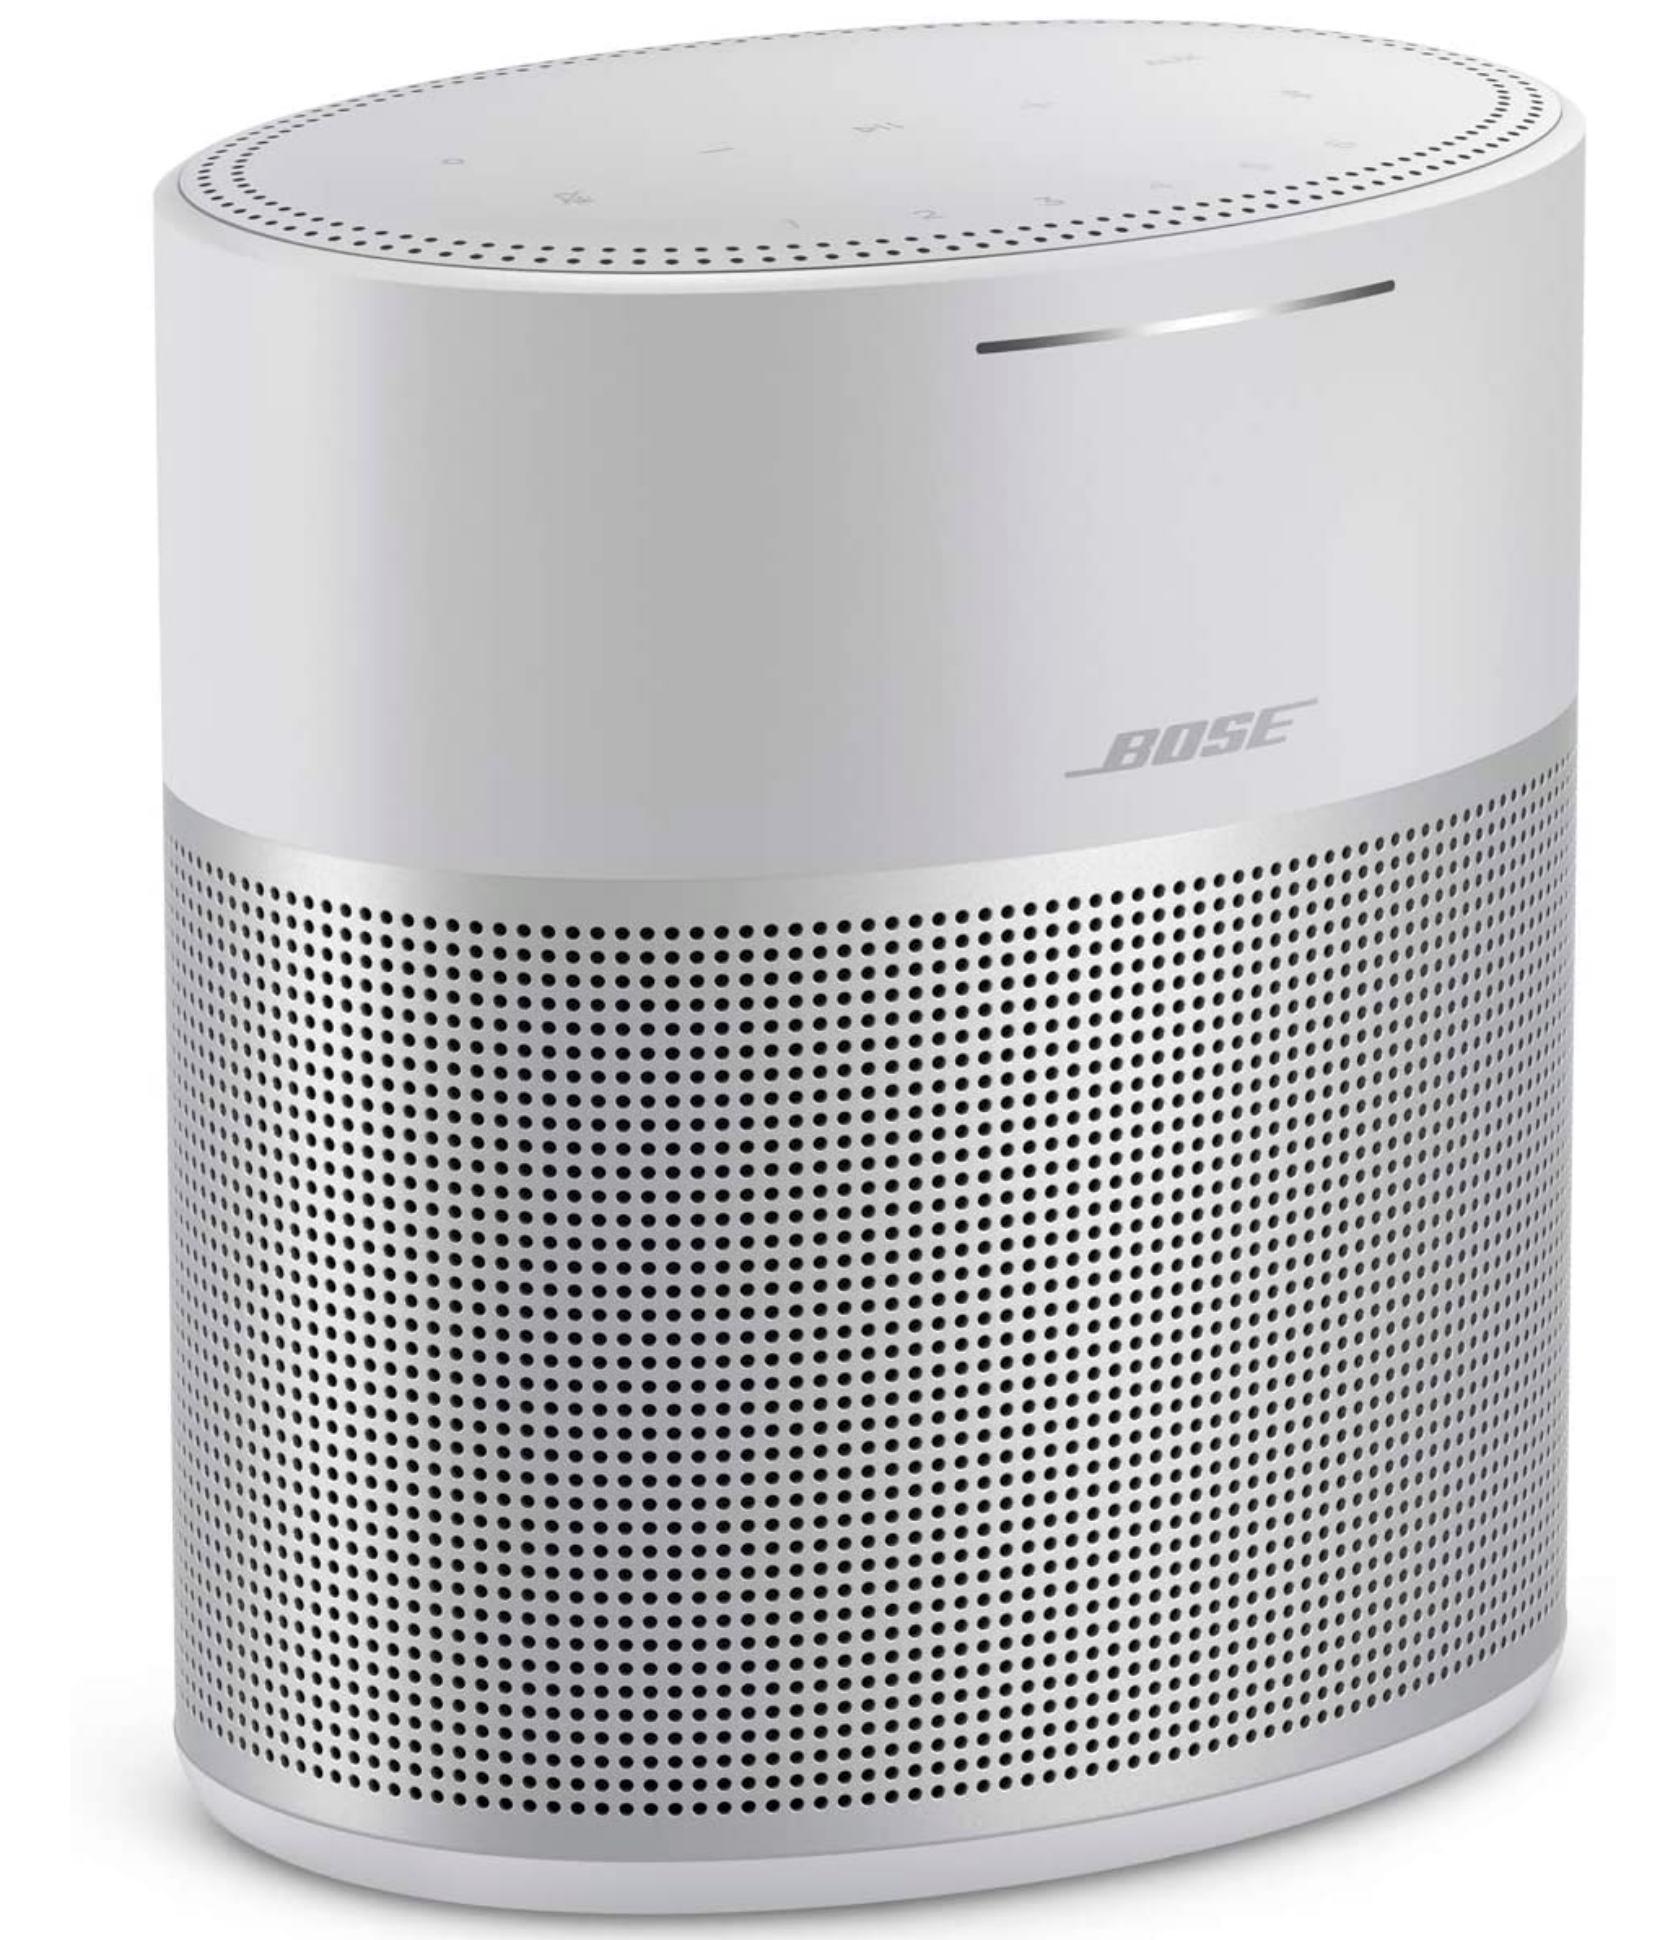 Bose Home 300 Alexa Google Assistant (Luxe Silver)